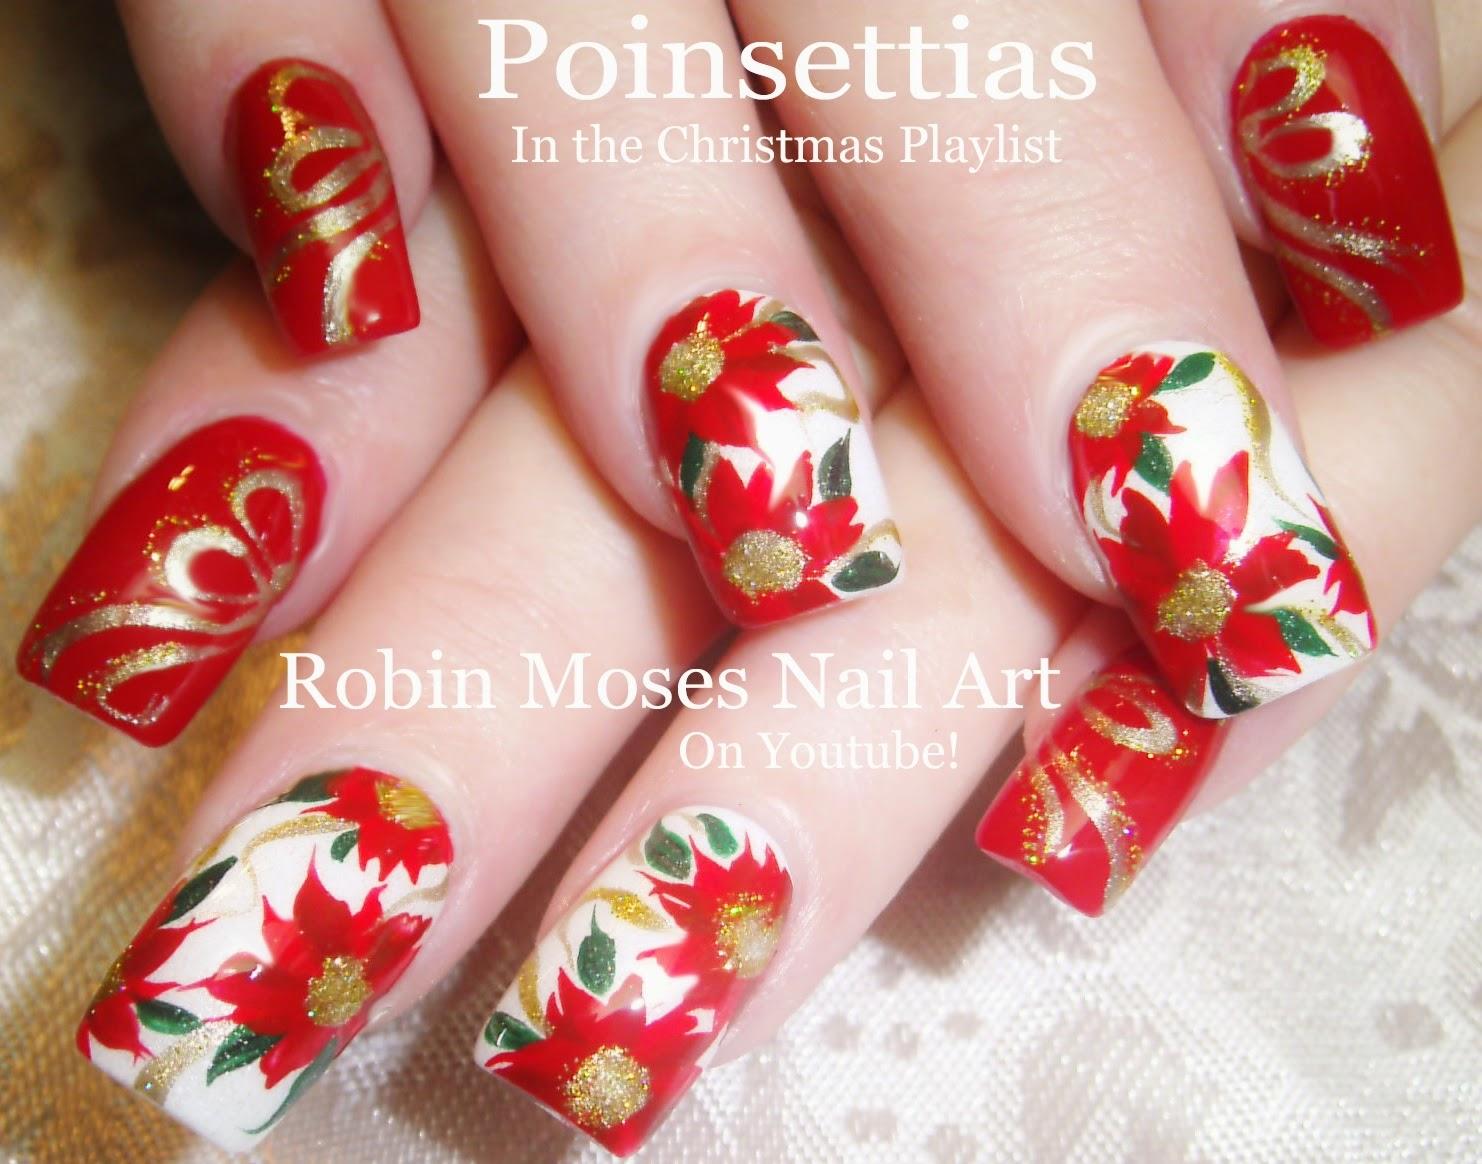 Robin Moses Nail Art Quot Christmas Nails Quot Quot Christmas Nail Art Quot Quot Xmas Nails Quot Quot Poinsettia Nails